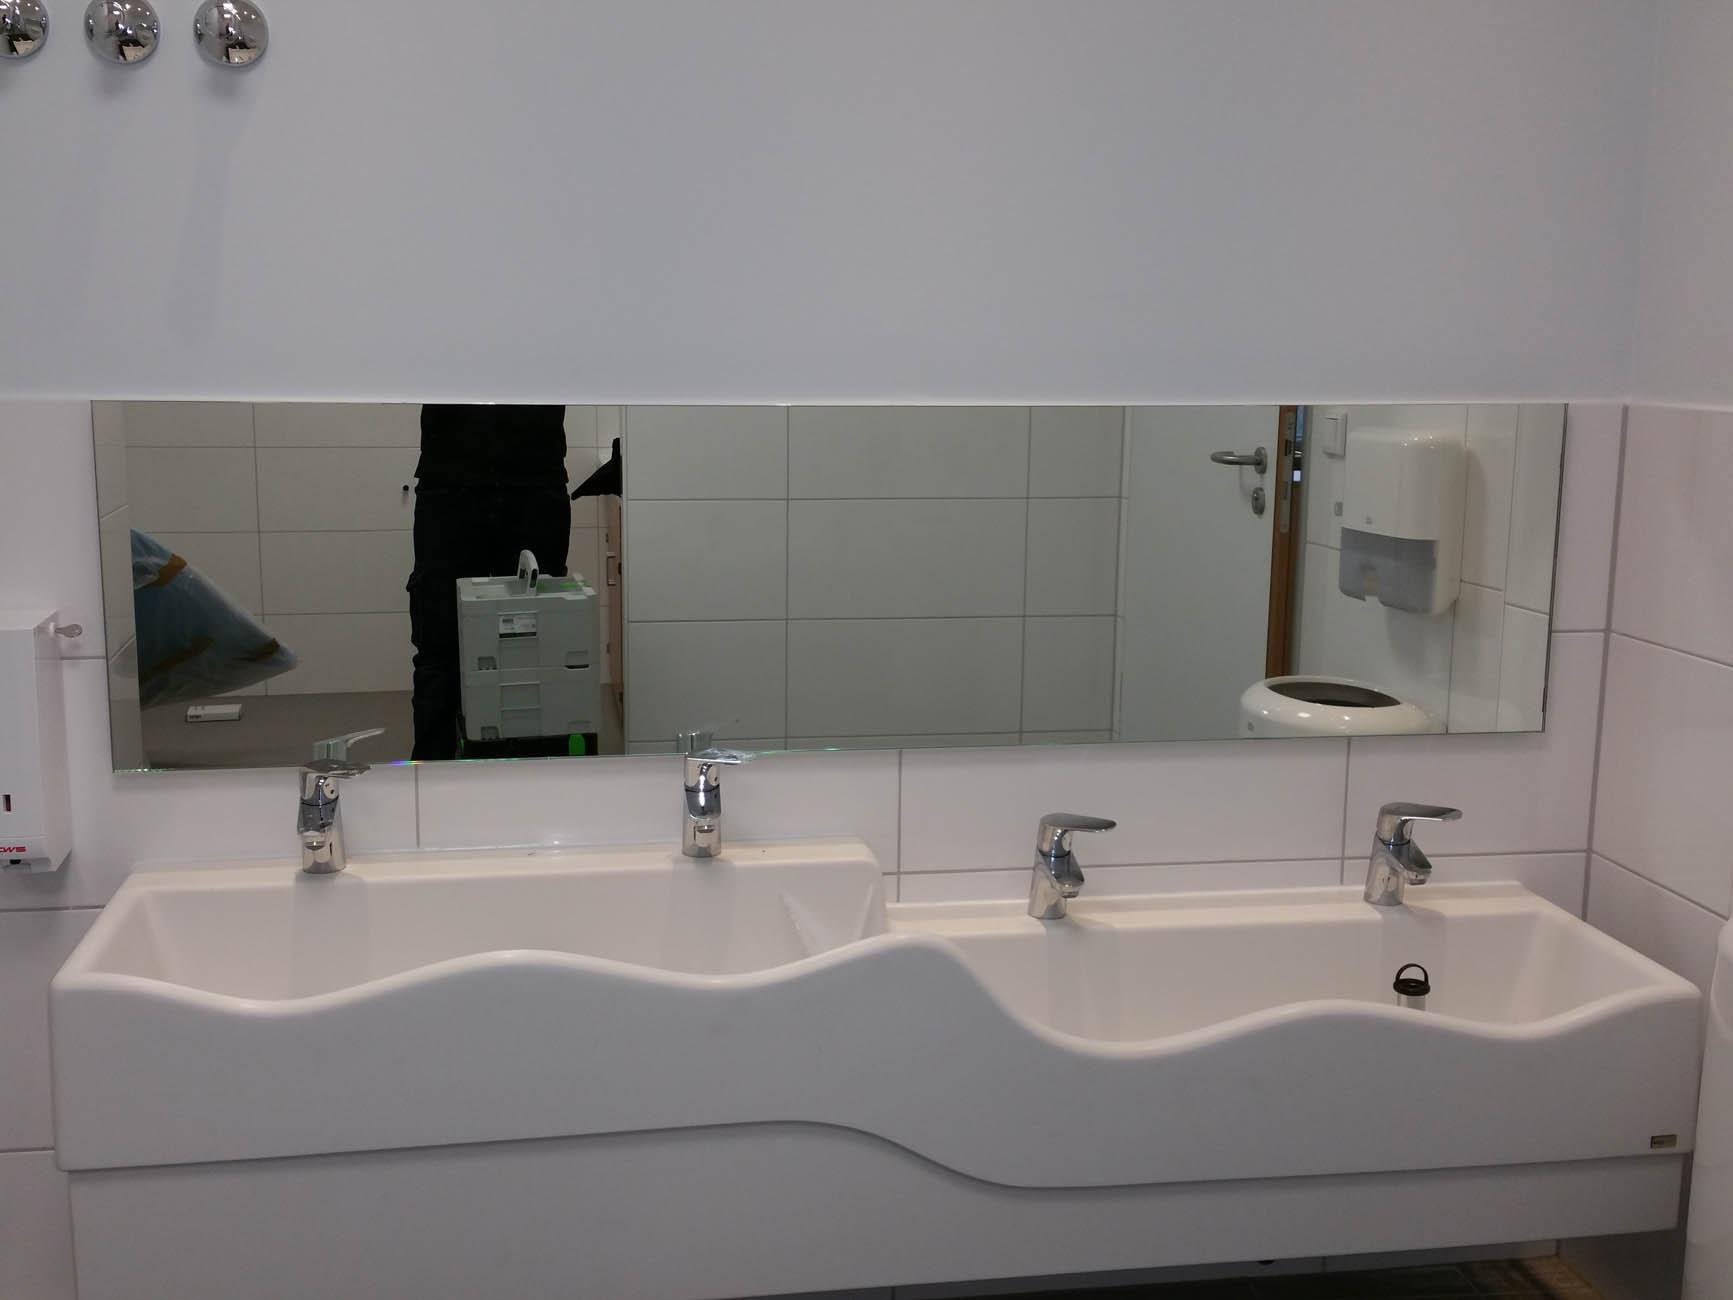 Spiegel nach ma f r b der egal ob rund oval eckig for Spiegel nach